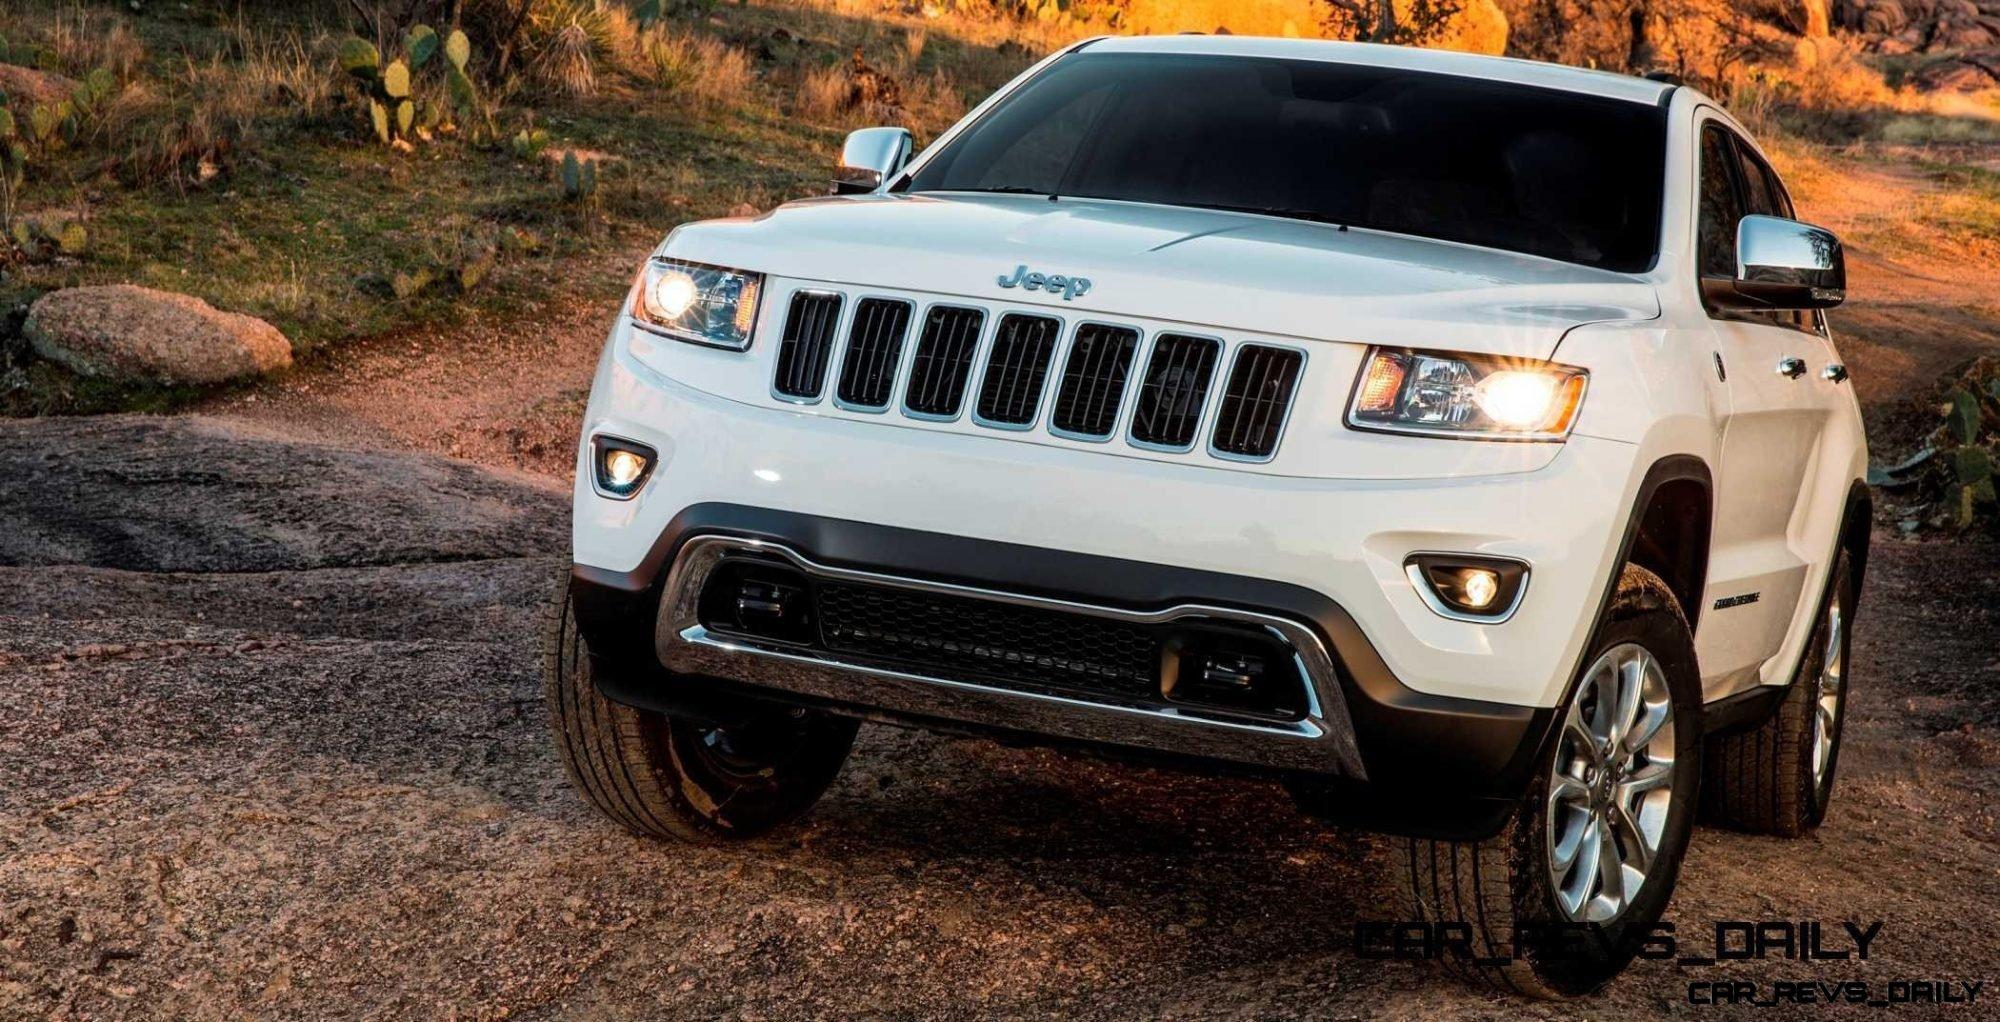 mea culpa 2014 jeep cherokee not fug nasty looks great in trailhawk trim car revs. Black Bedroom Furniture Sets. Home Design Ideas